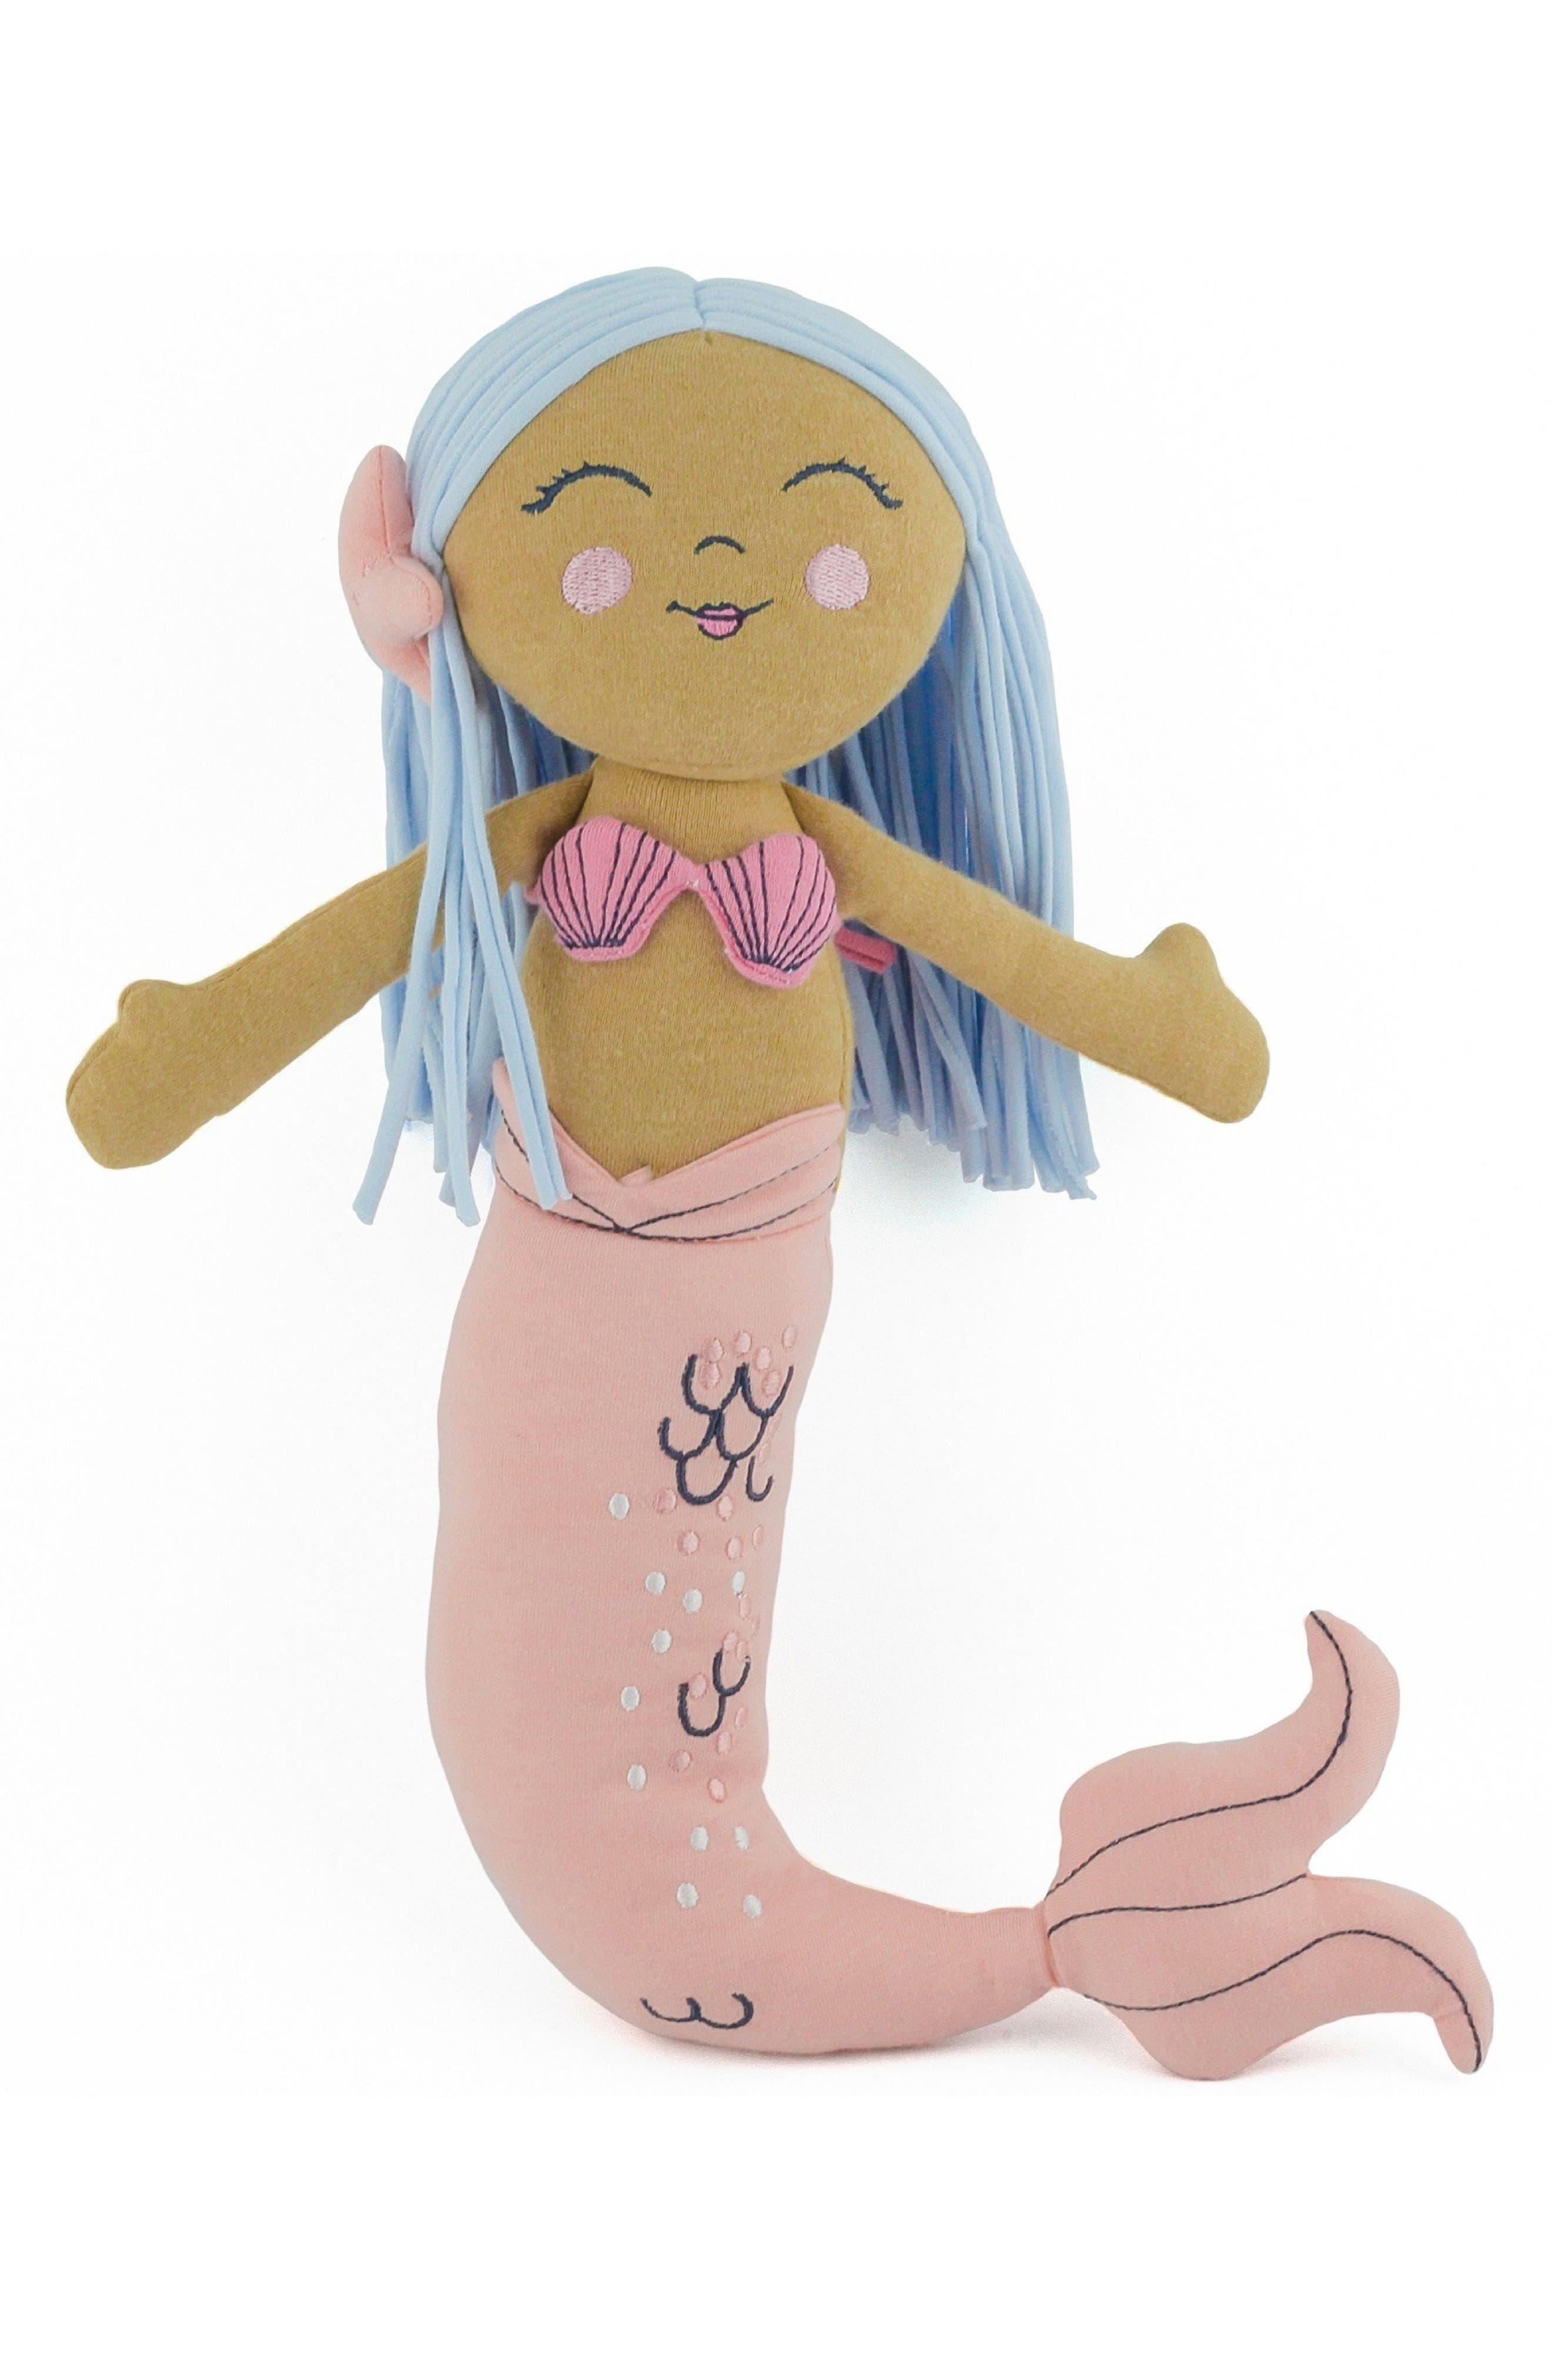 ELLY LU ORGANICS Leialoha Mermaid Stuffed Doll